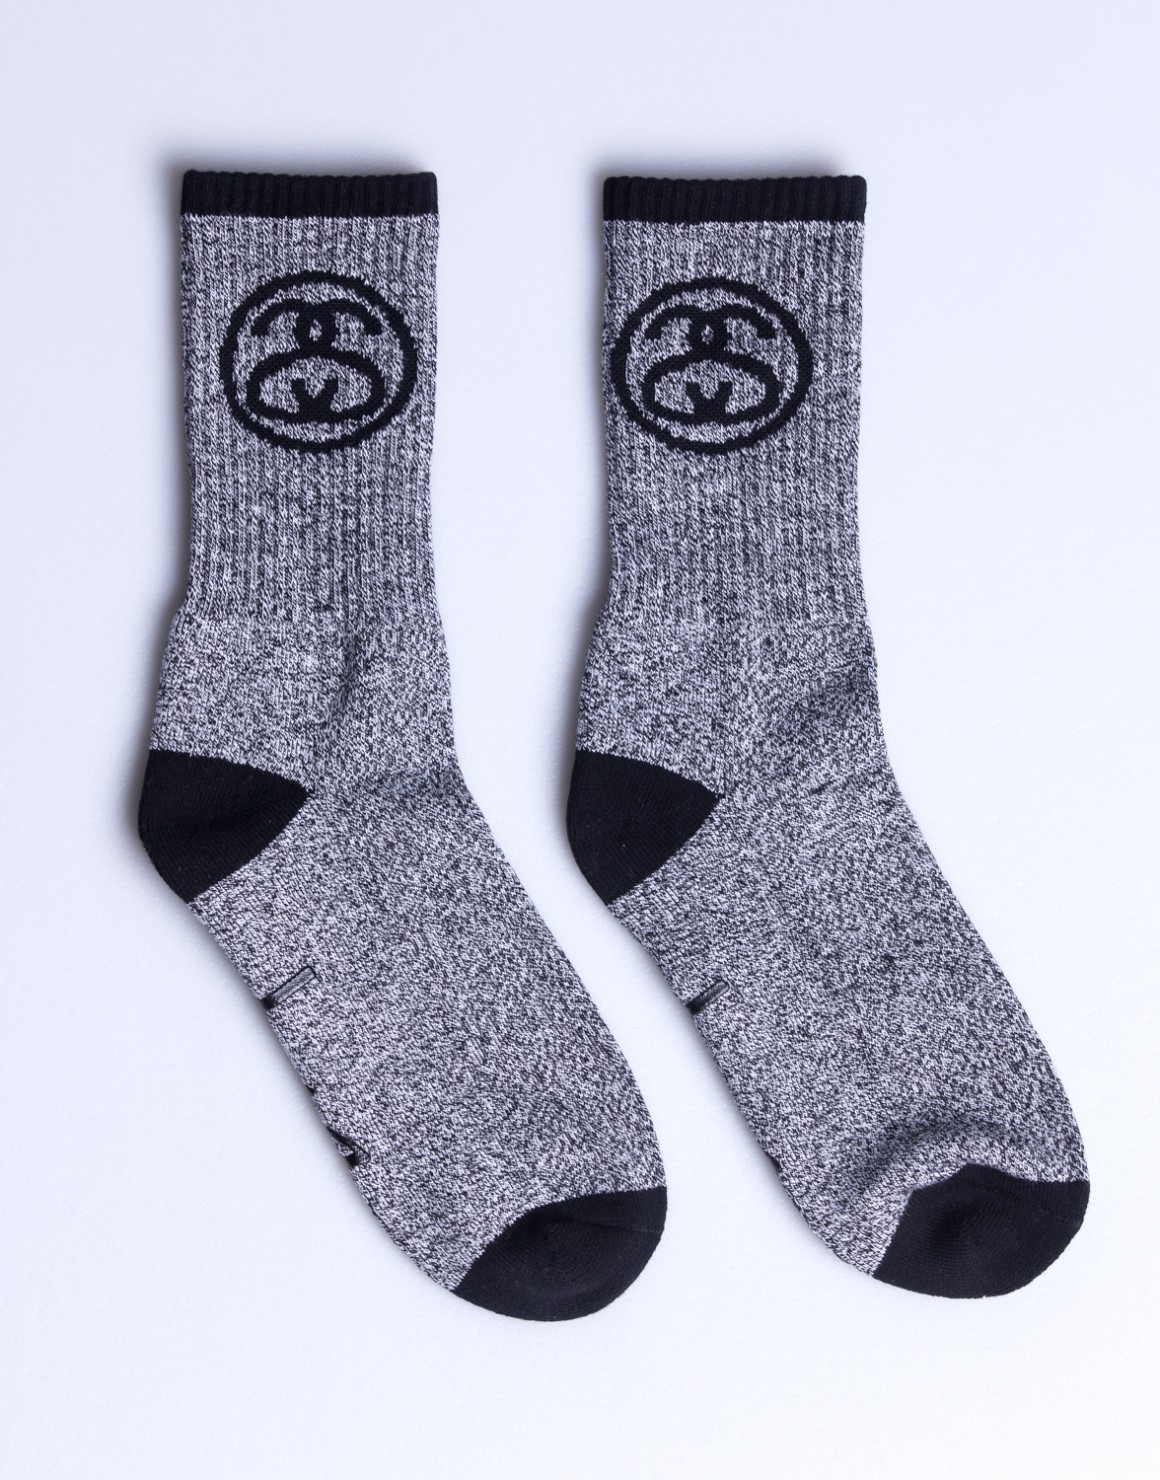 Ss-Link Socks